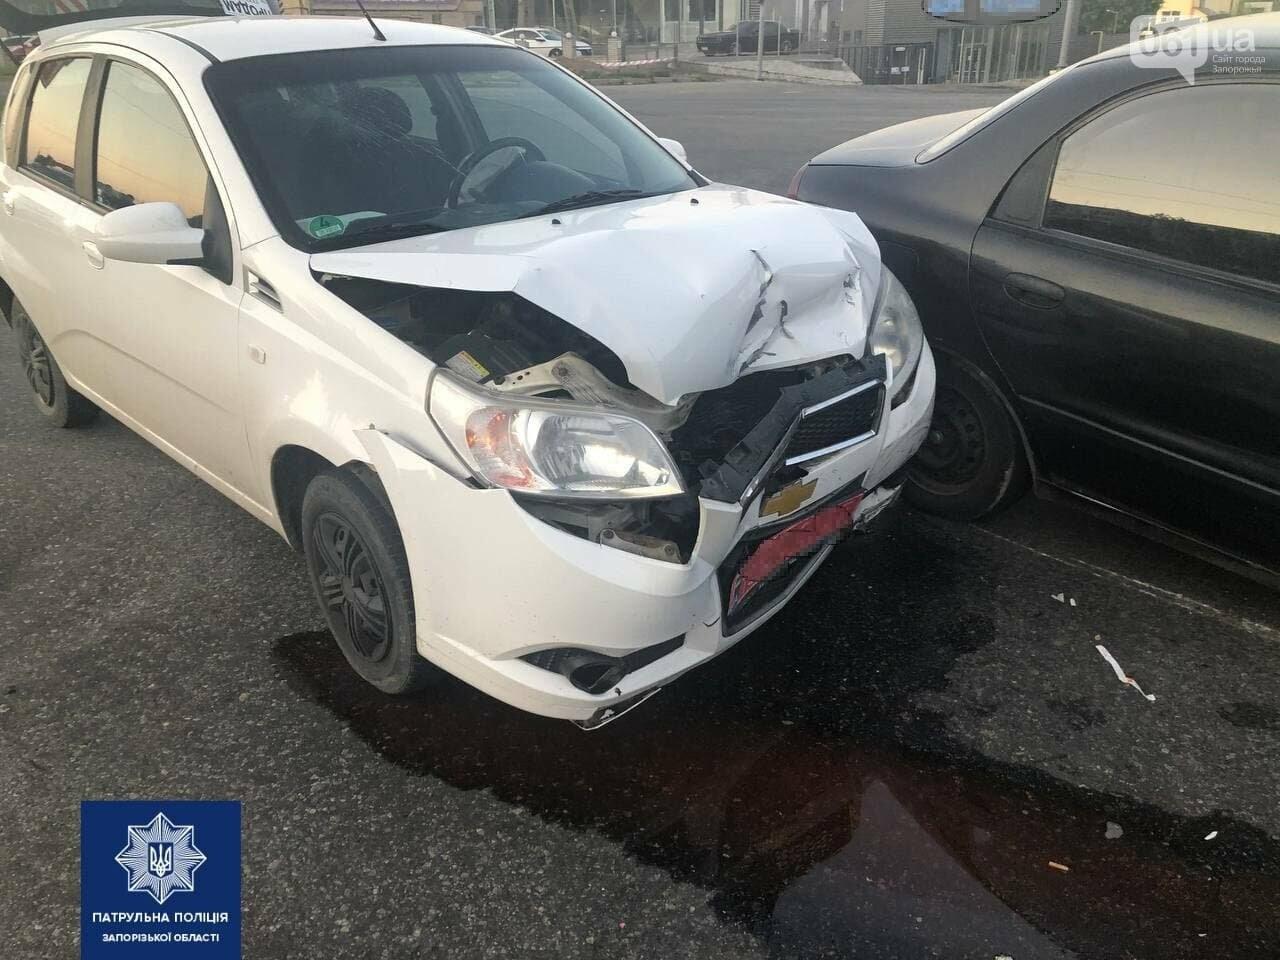 photo2021 07 1210 35 51 60ec193e9fbfd - В Запорожье возле Набережной магистрали произошло ДТП: от столкновения у автомобиля оторвало колесо, - ФОТО